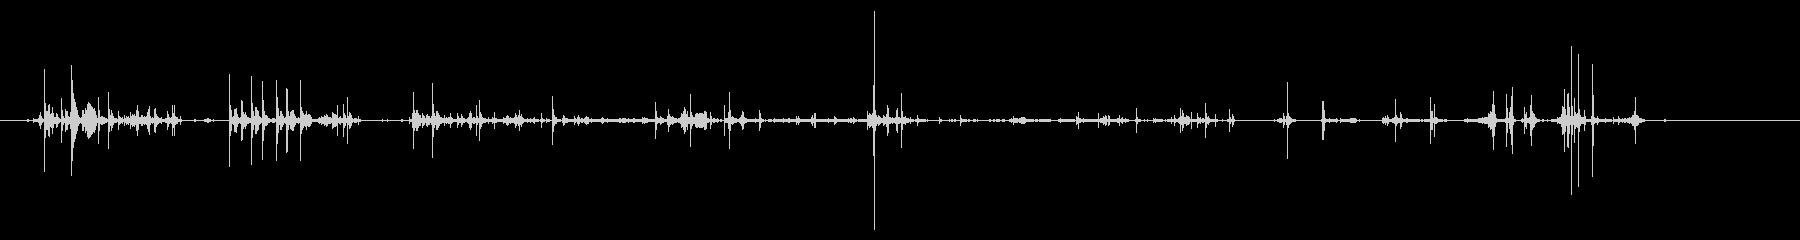 Rolodexファイリングシステム...の未再生の波形